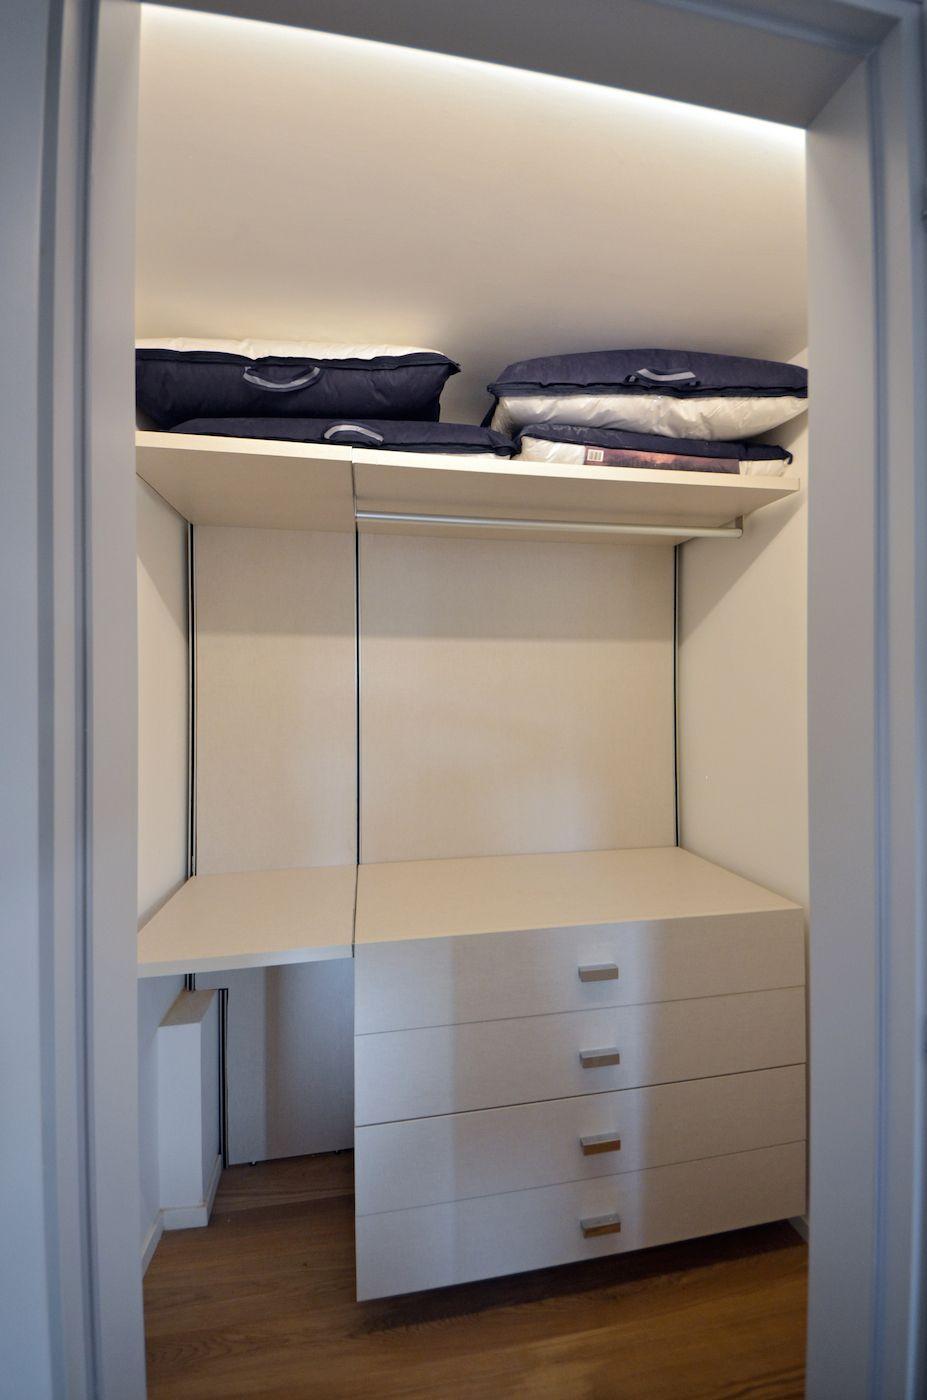 walk-in wardrobe of the double bedroom